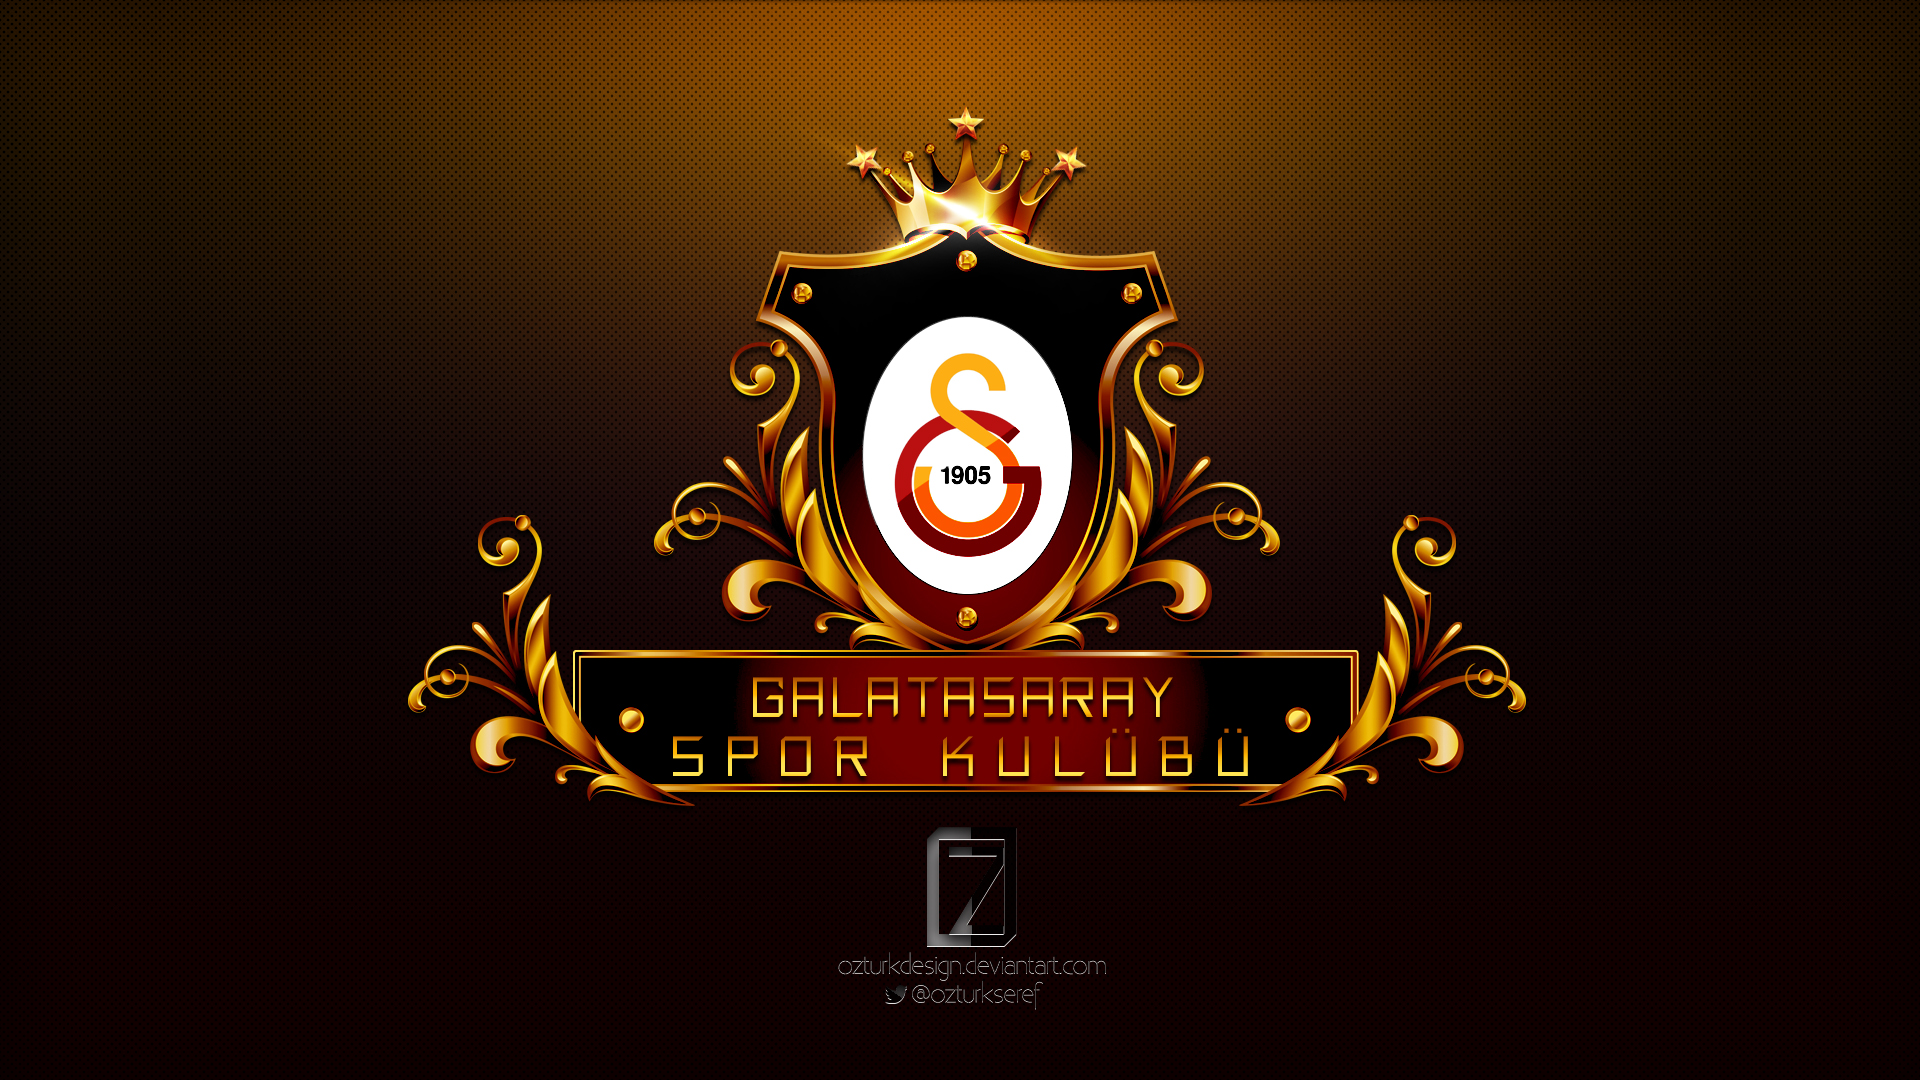 659578 Galatasaray Wallpapers 1920x1080